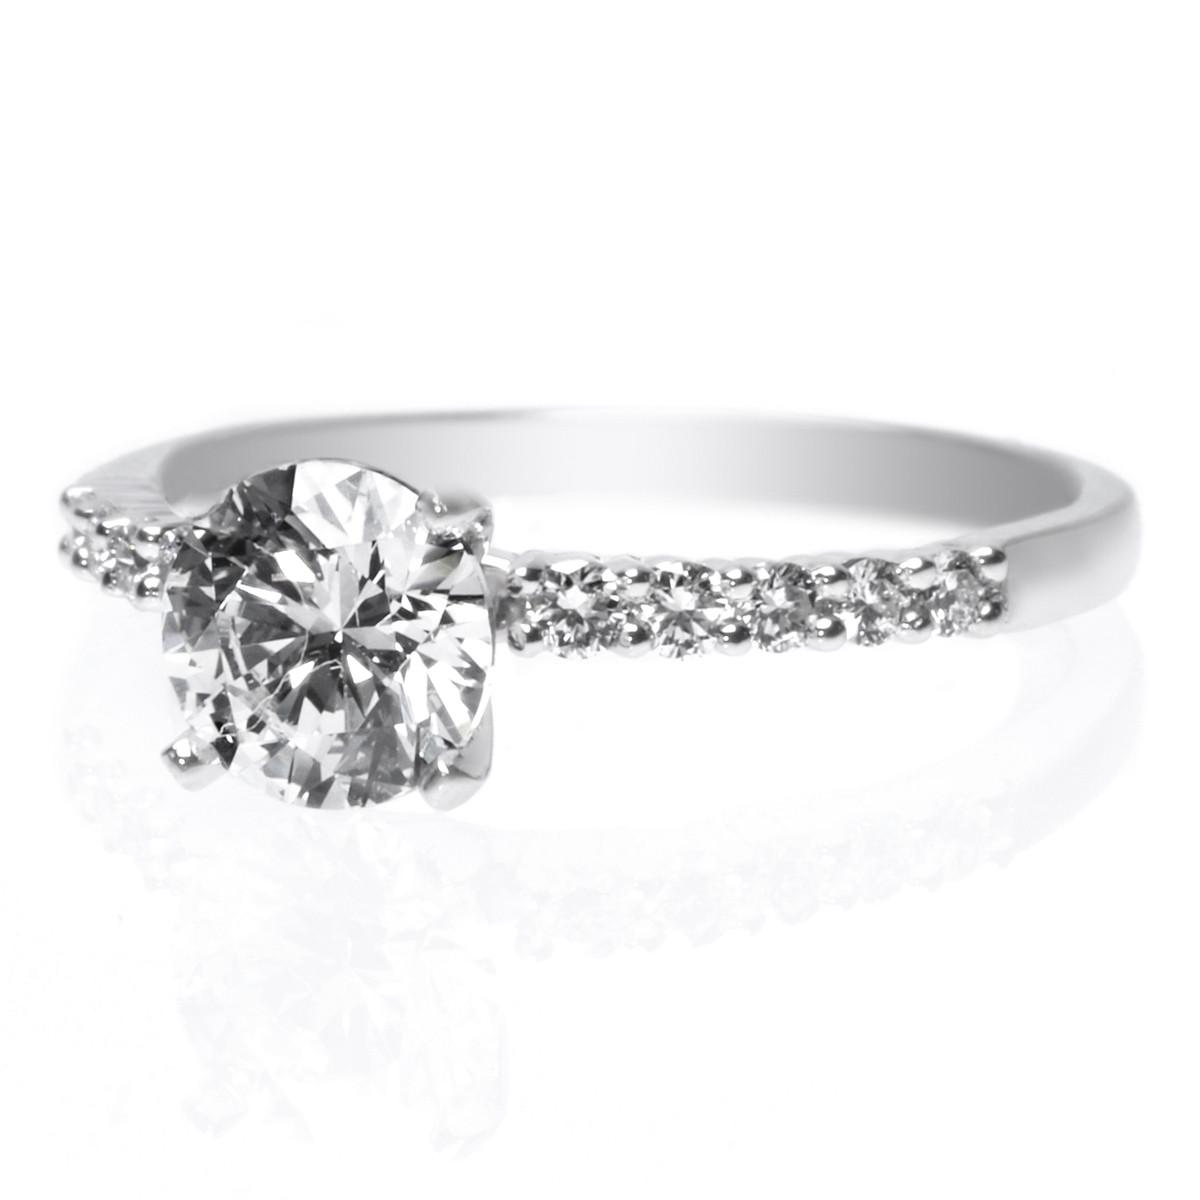 Platinum Four Prong Ten Stone Diamond Engagement Ring